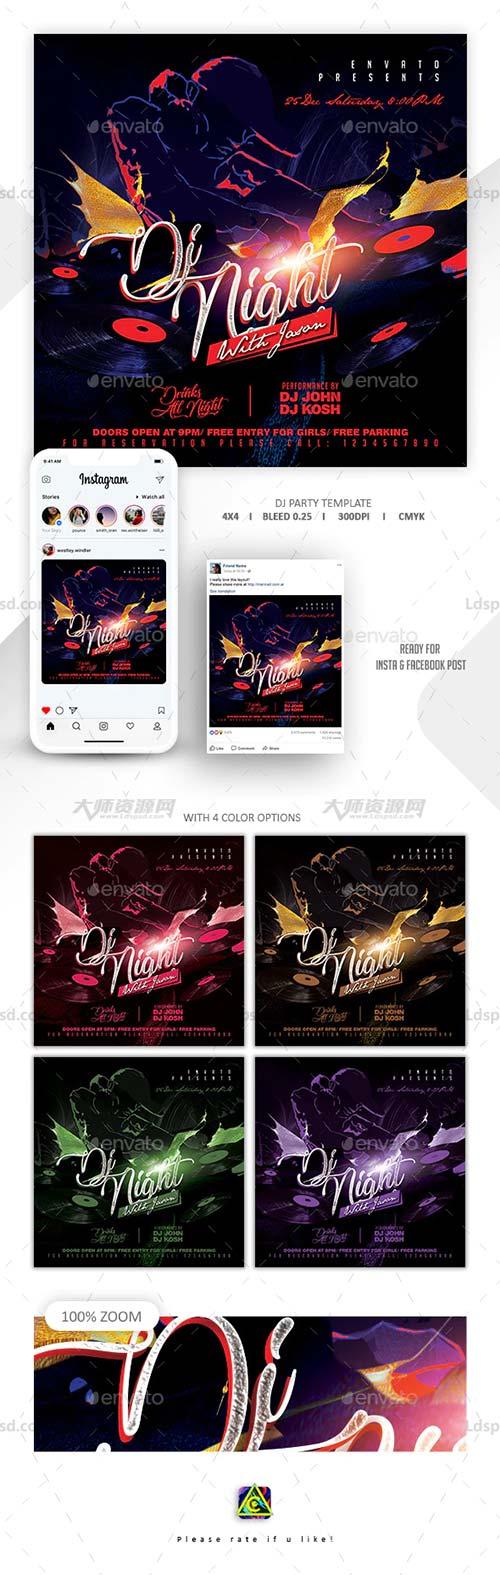 DJ之夜派对海报/传单PSD模板(手机端):Dj Tour Flyer Template